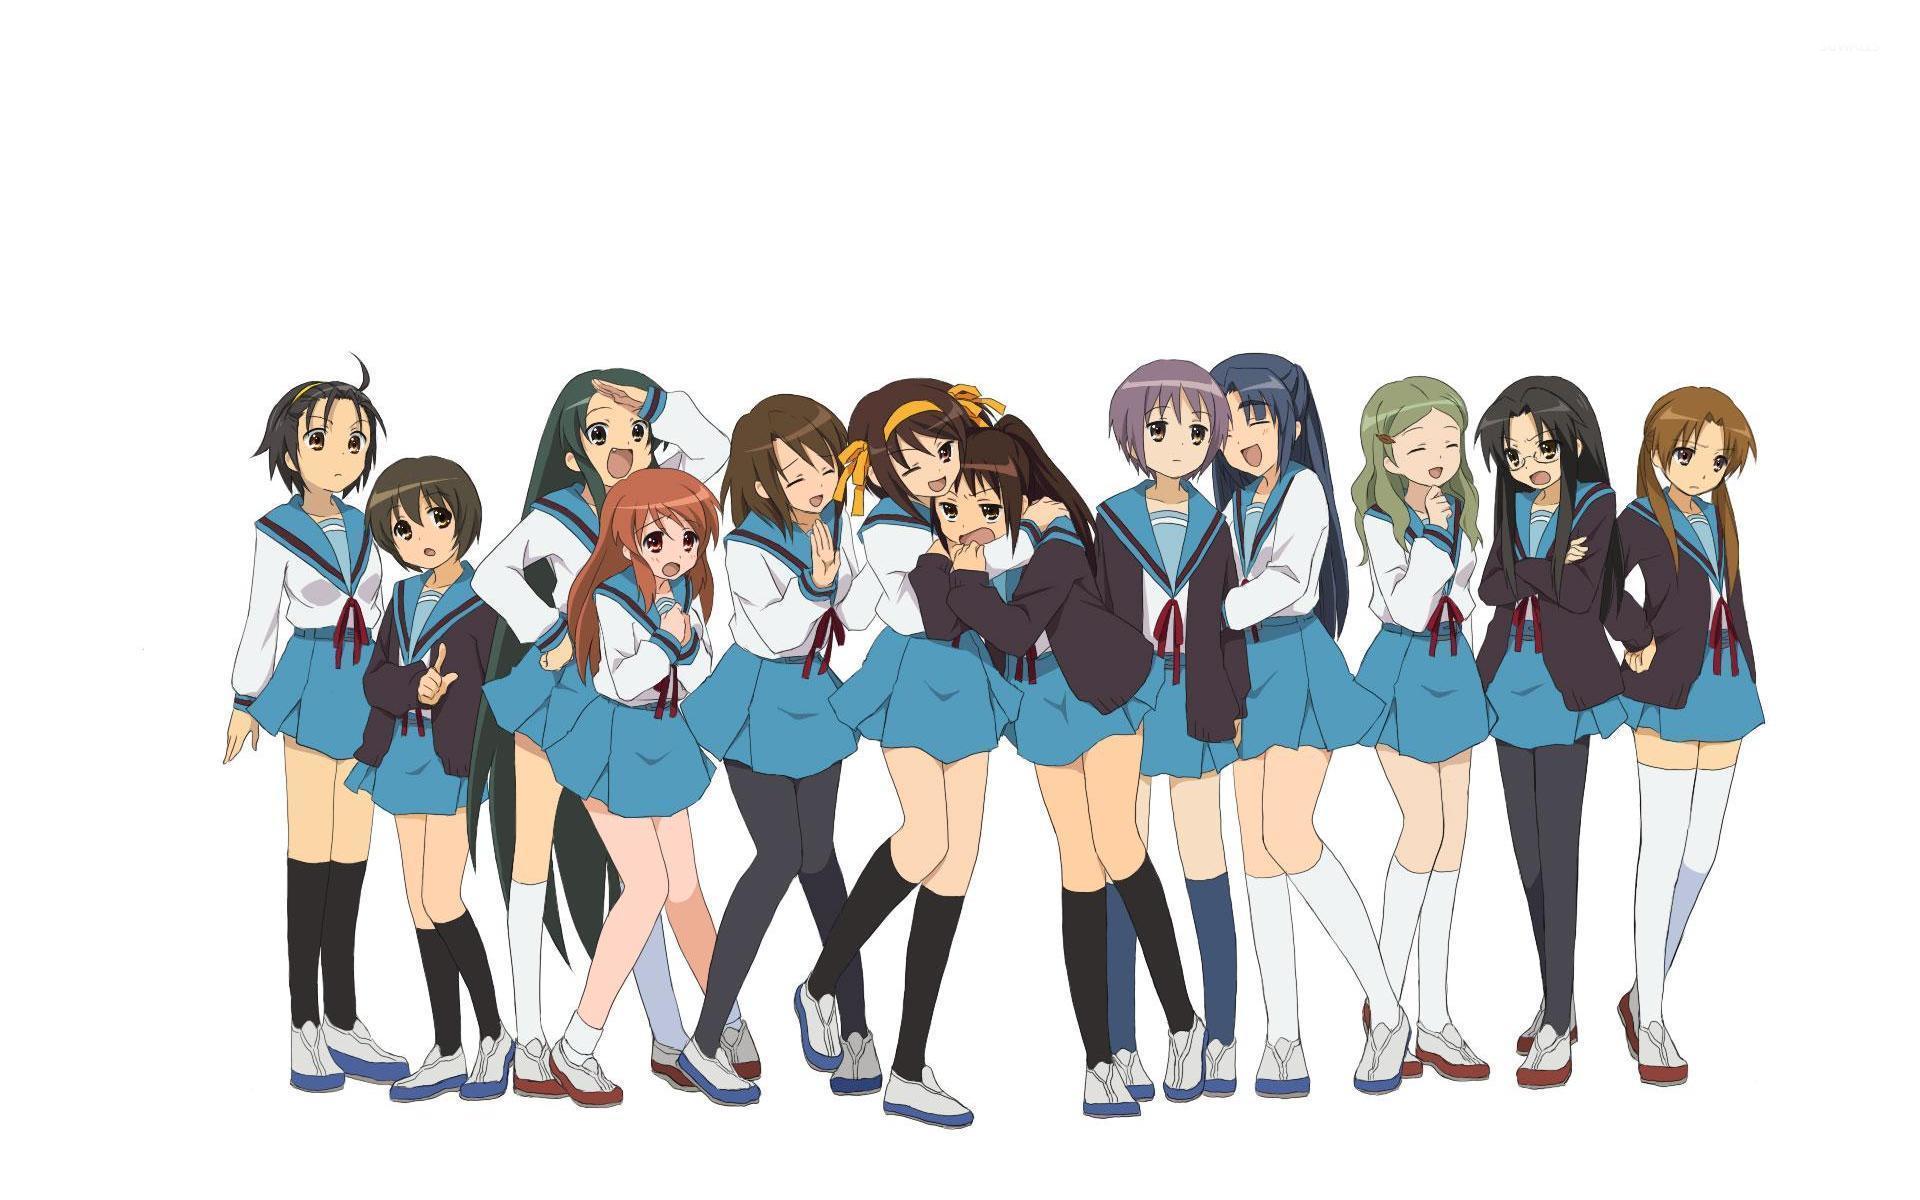 The Melancholy Of Haruhi Suzumiya 3 Wallpaper Anime Wallpapers